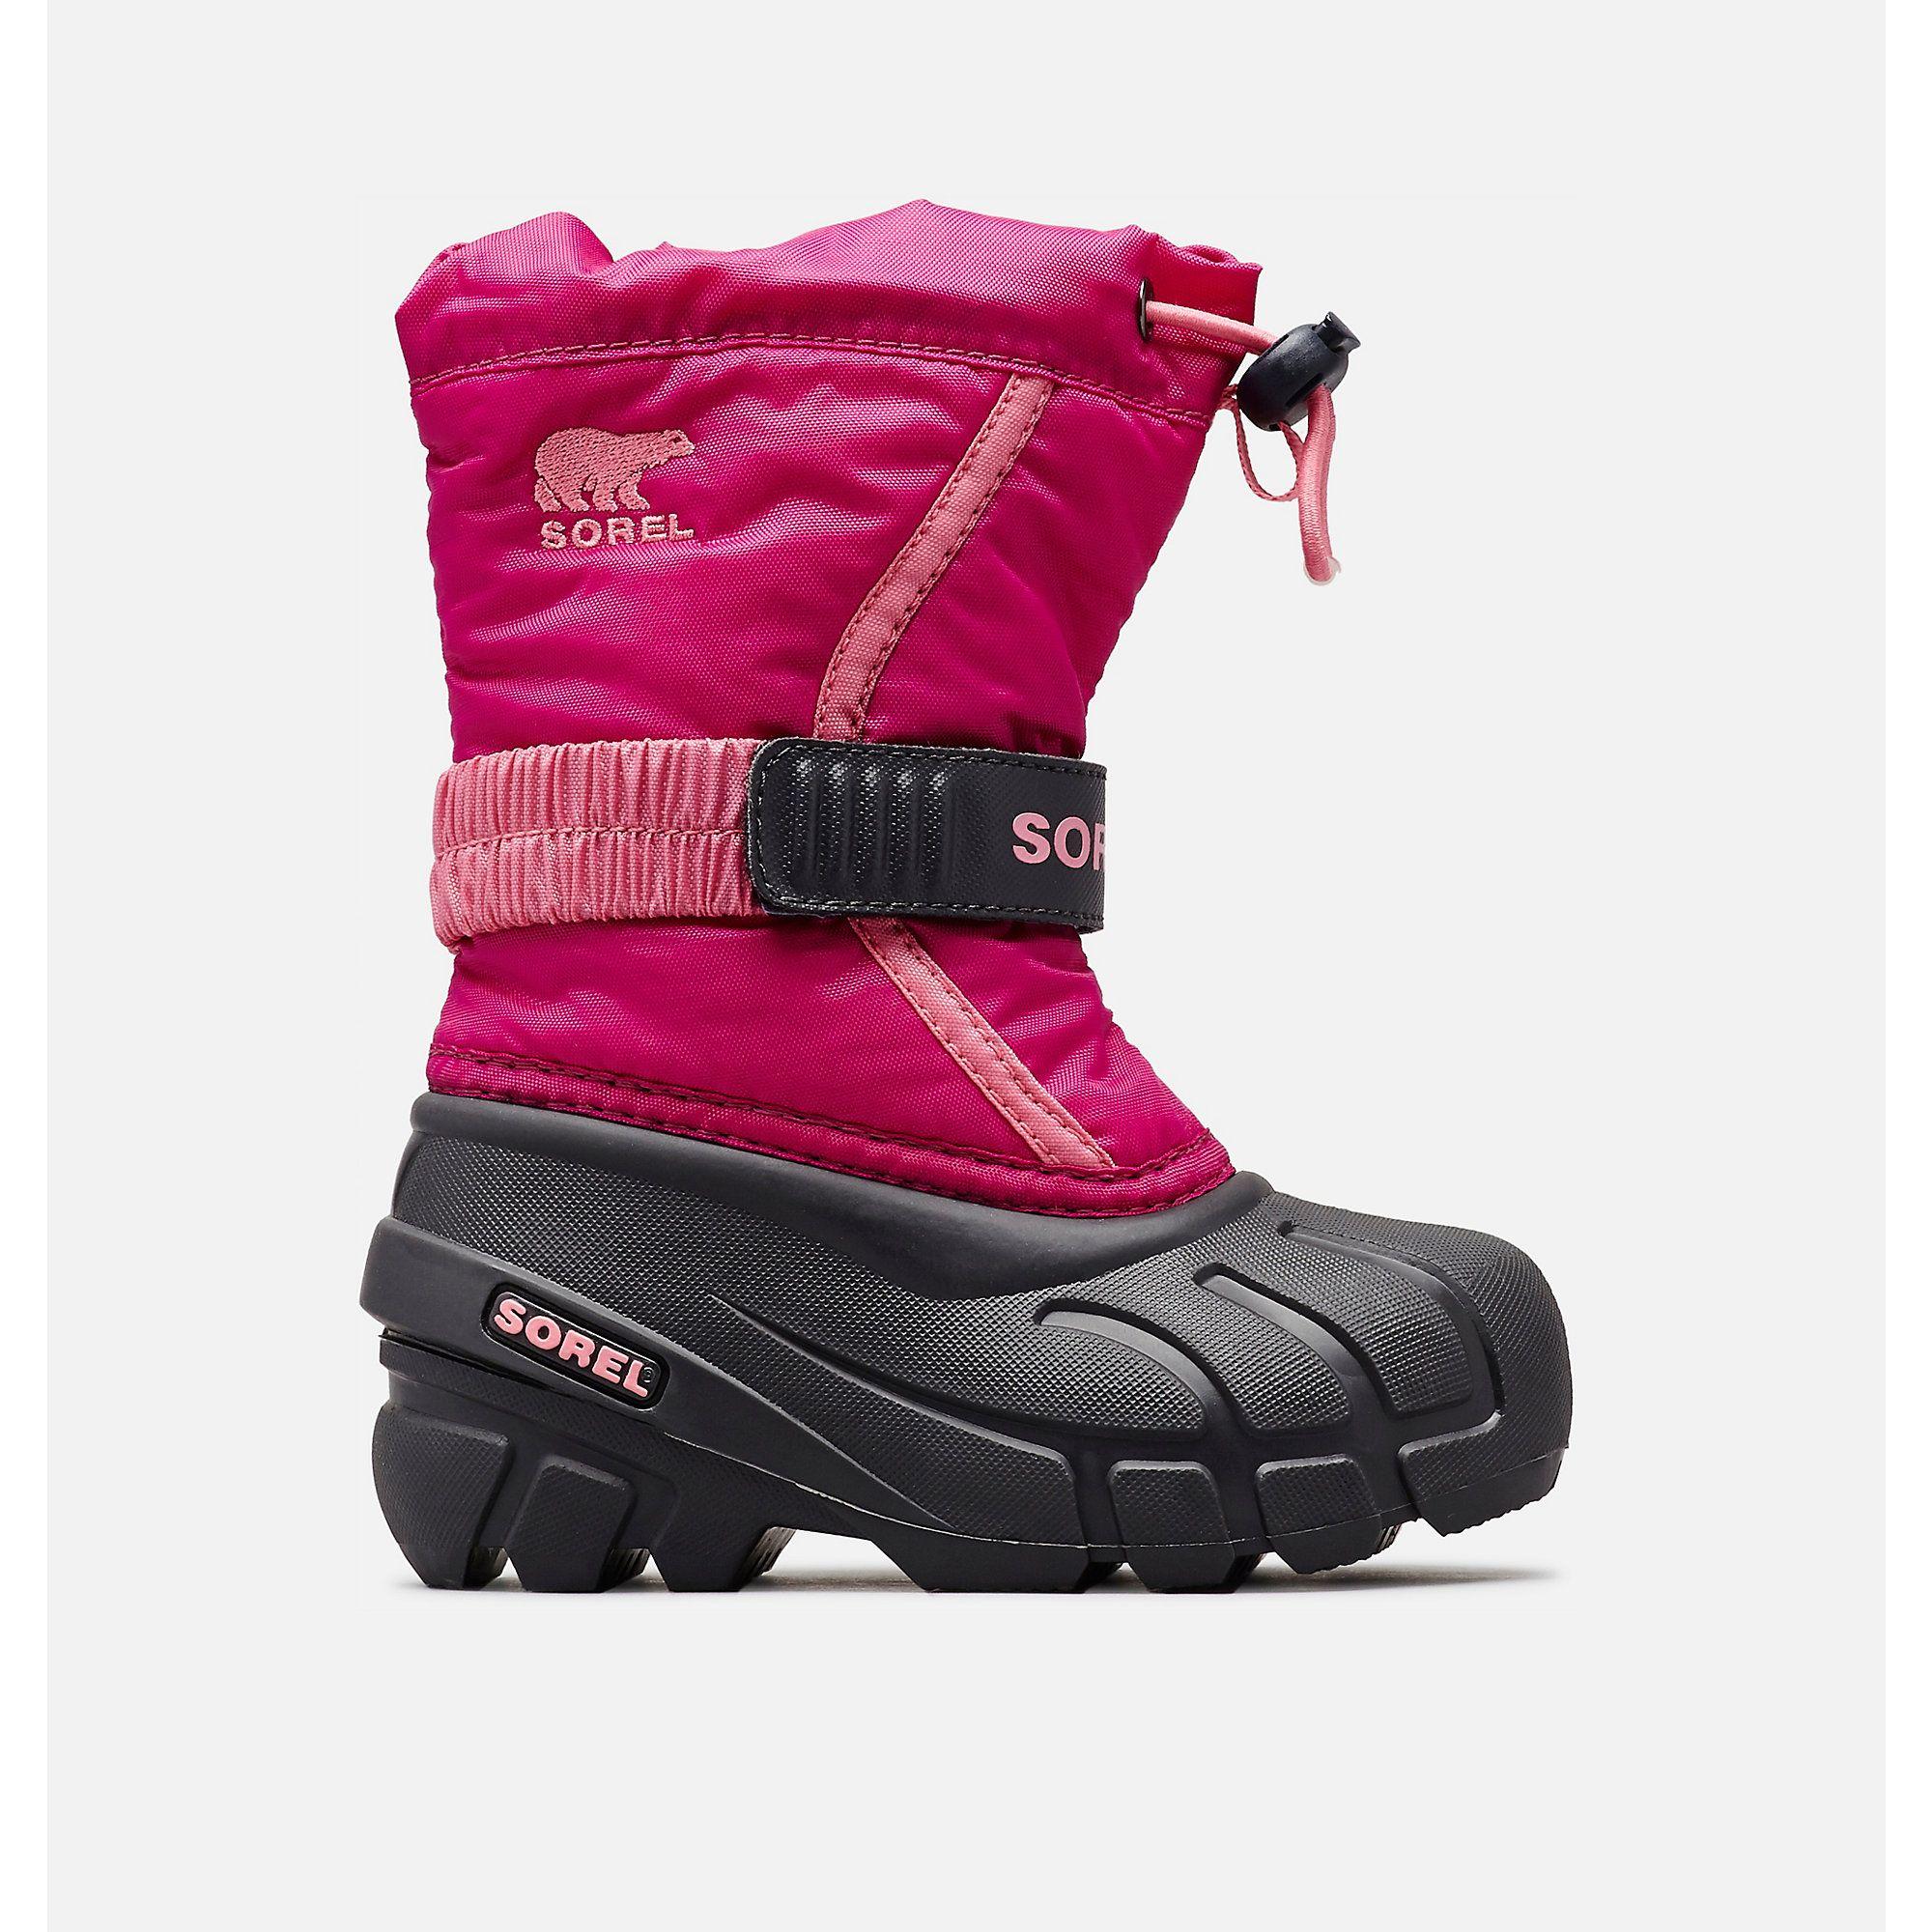 Sorel Kids Childrens Flurry Snow Boot